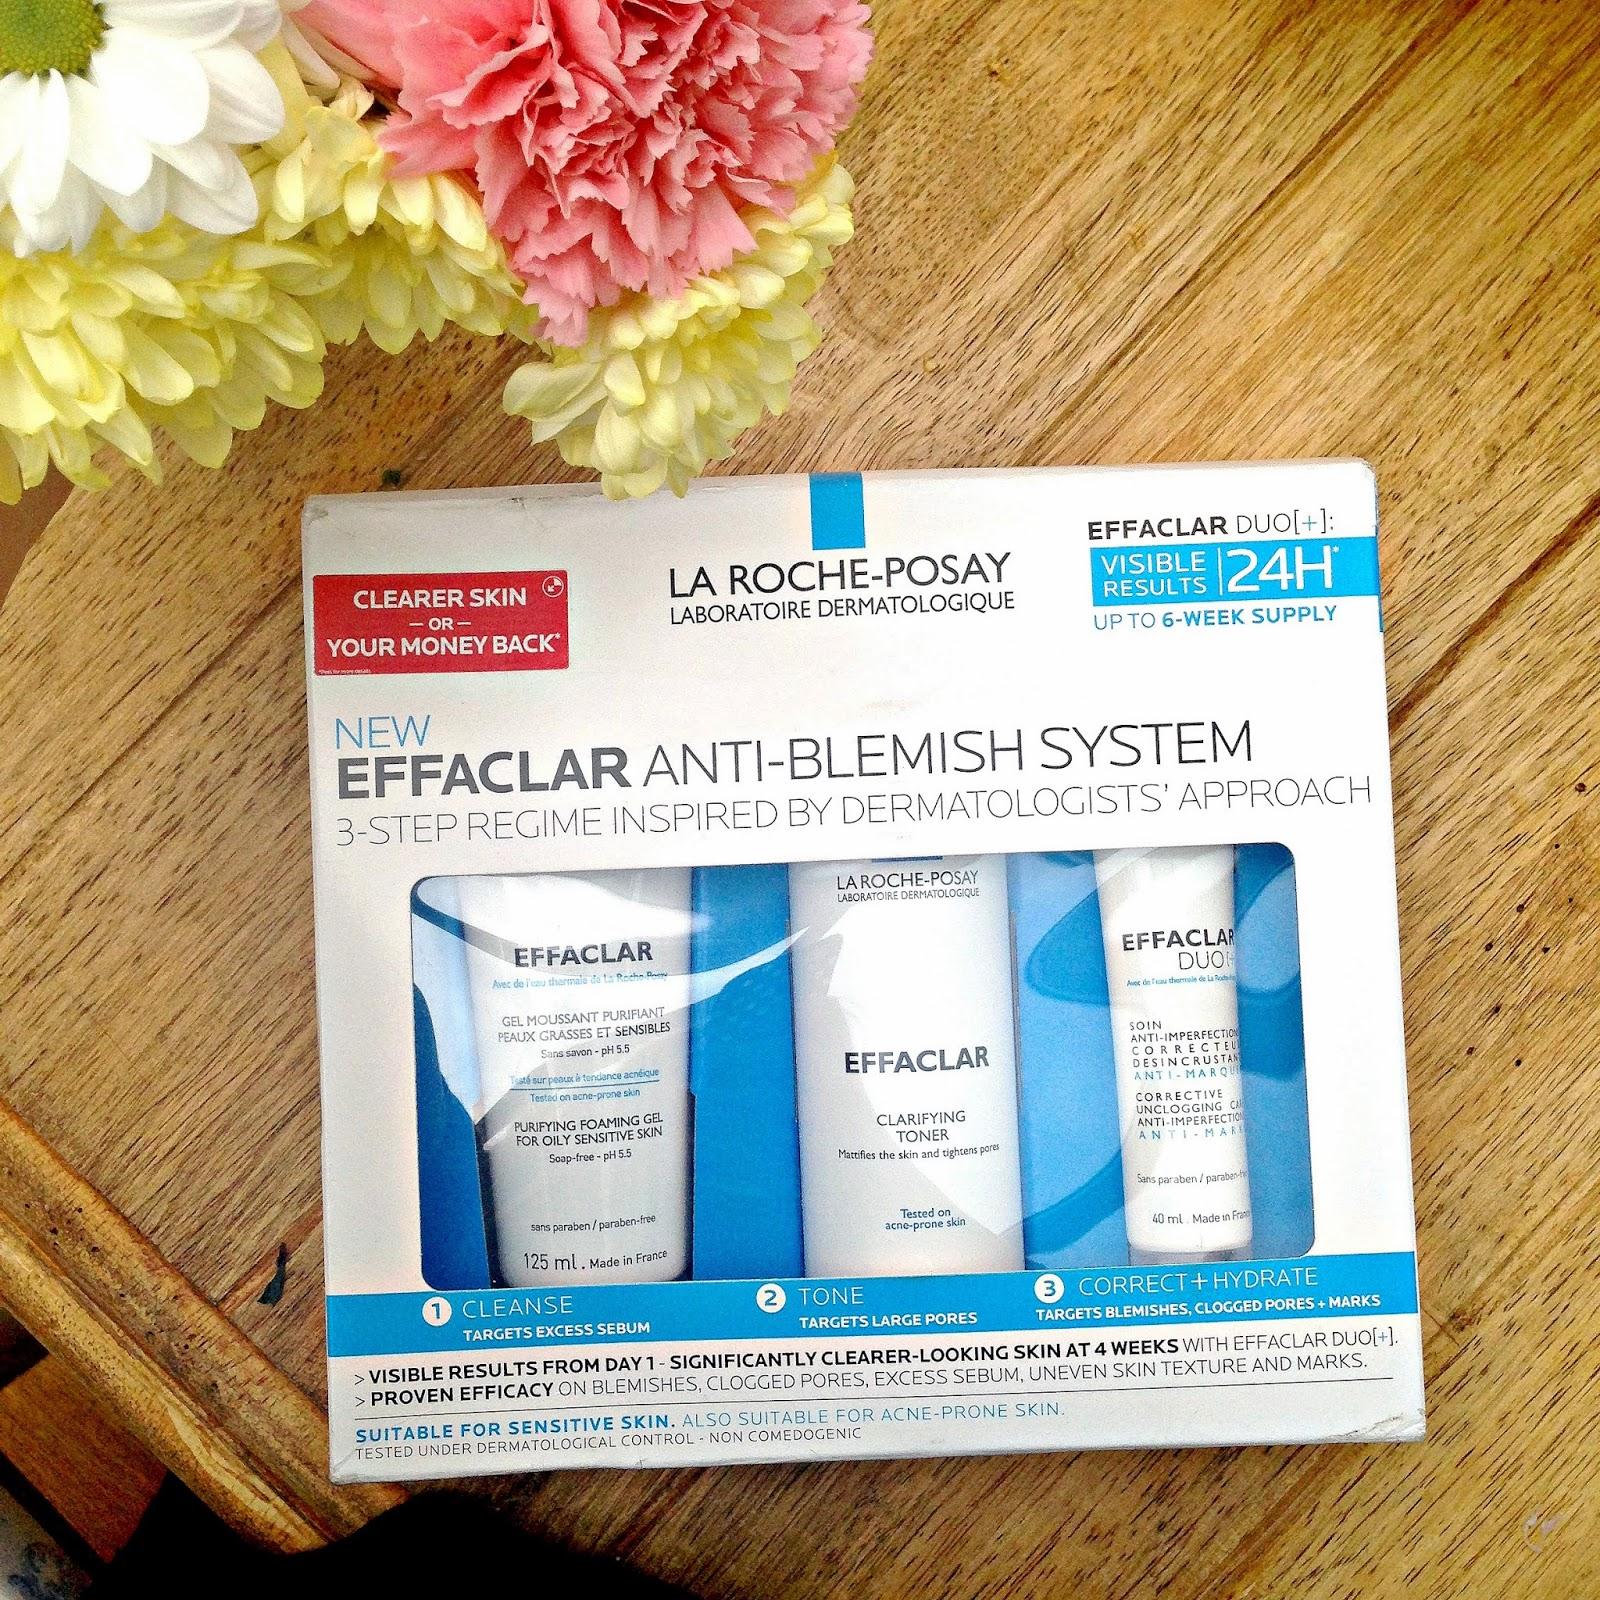 la roche posay new effalclar anti blemish system